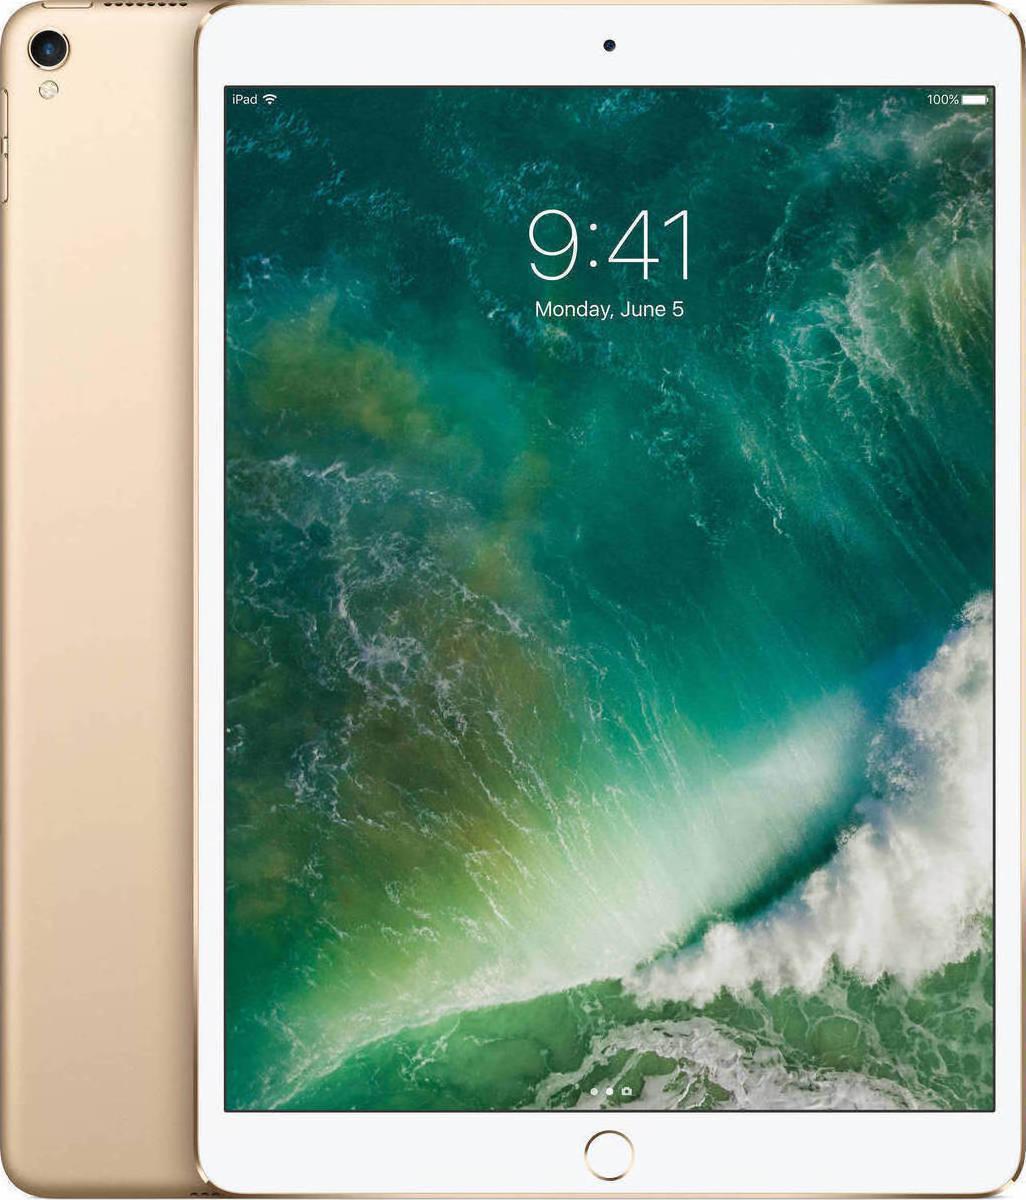 Apple iPad Pro 12.9'' 2017 WiFi and Cellular 512GB Gold Με Αντάπτορα Πληρωμή έως 12 δόσεις